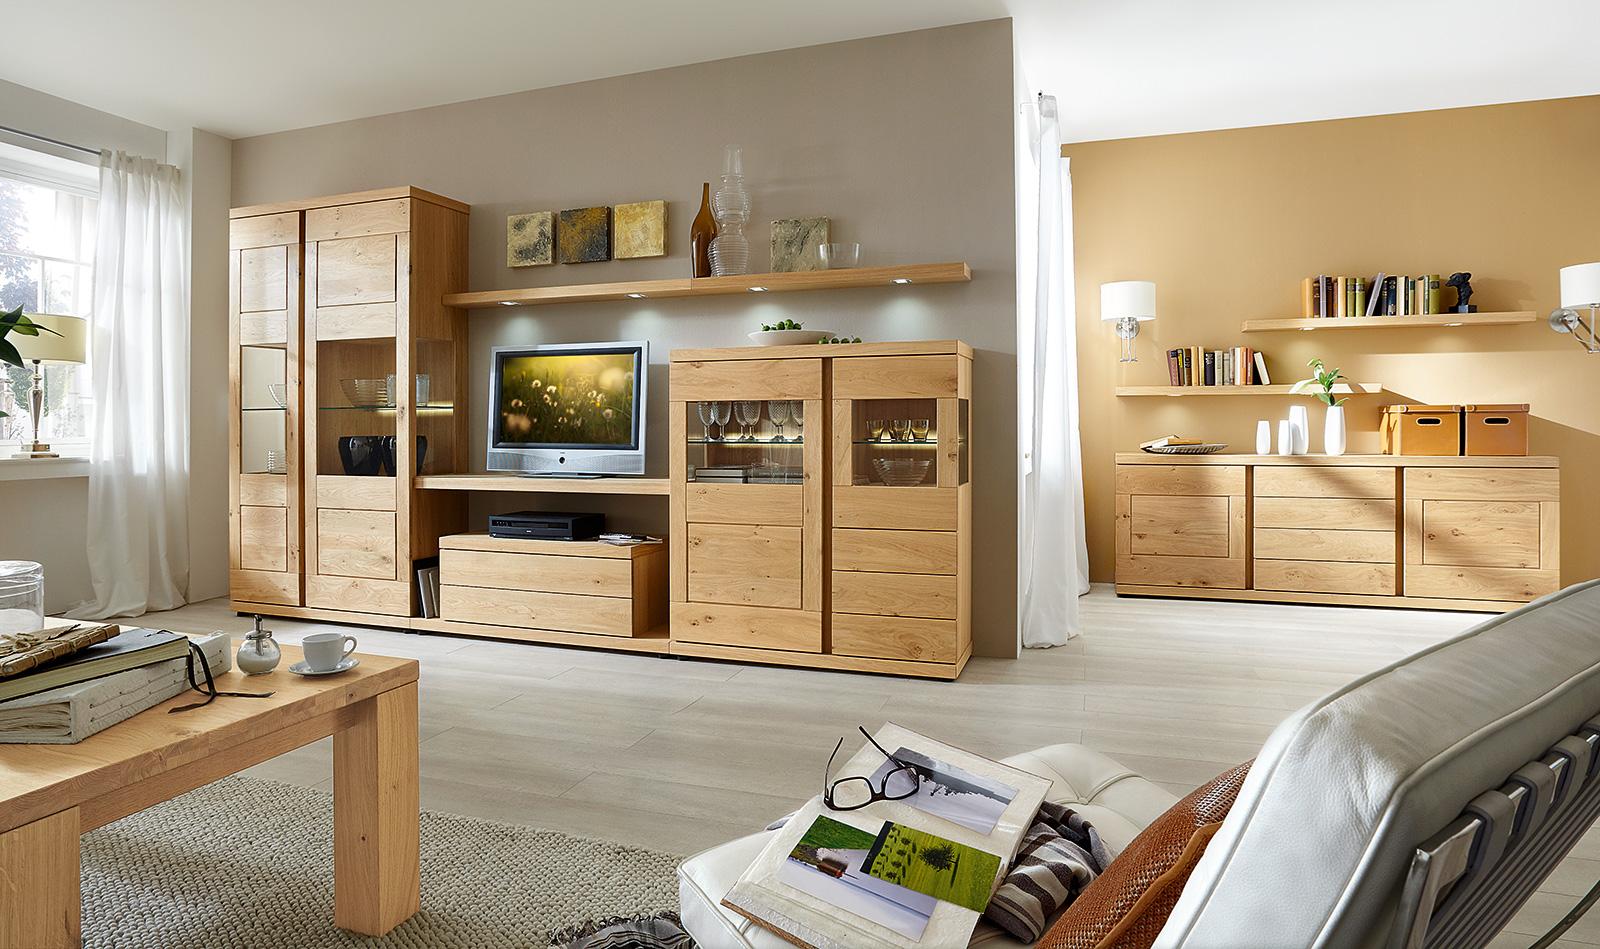 wohnzimmer programme next level 6 0 venjakob m bel vorsprung durch design und qualit t. Black Bedroom Furniture Sets. Home Design Ideas